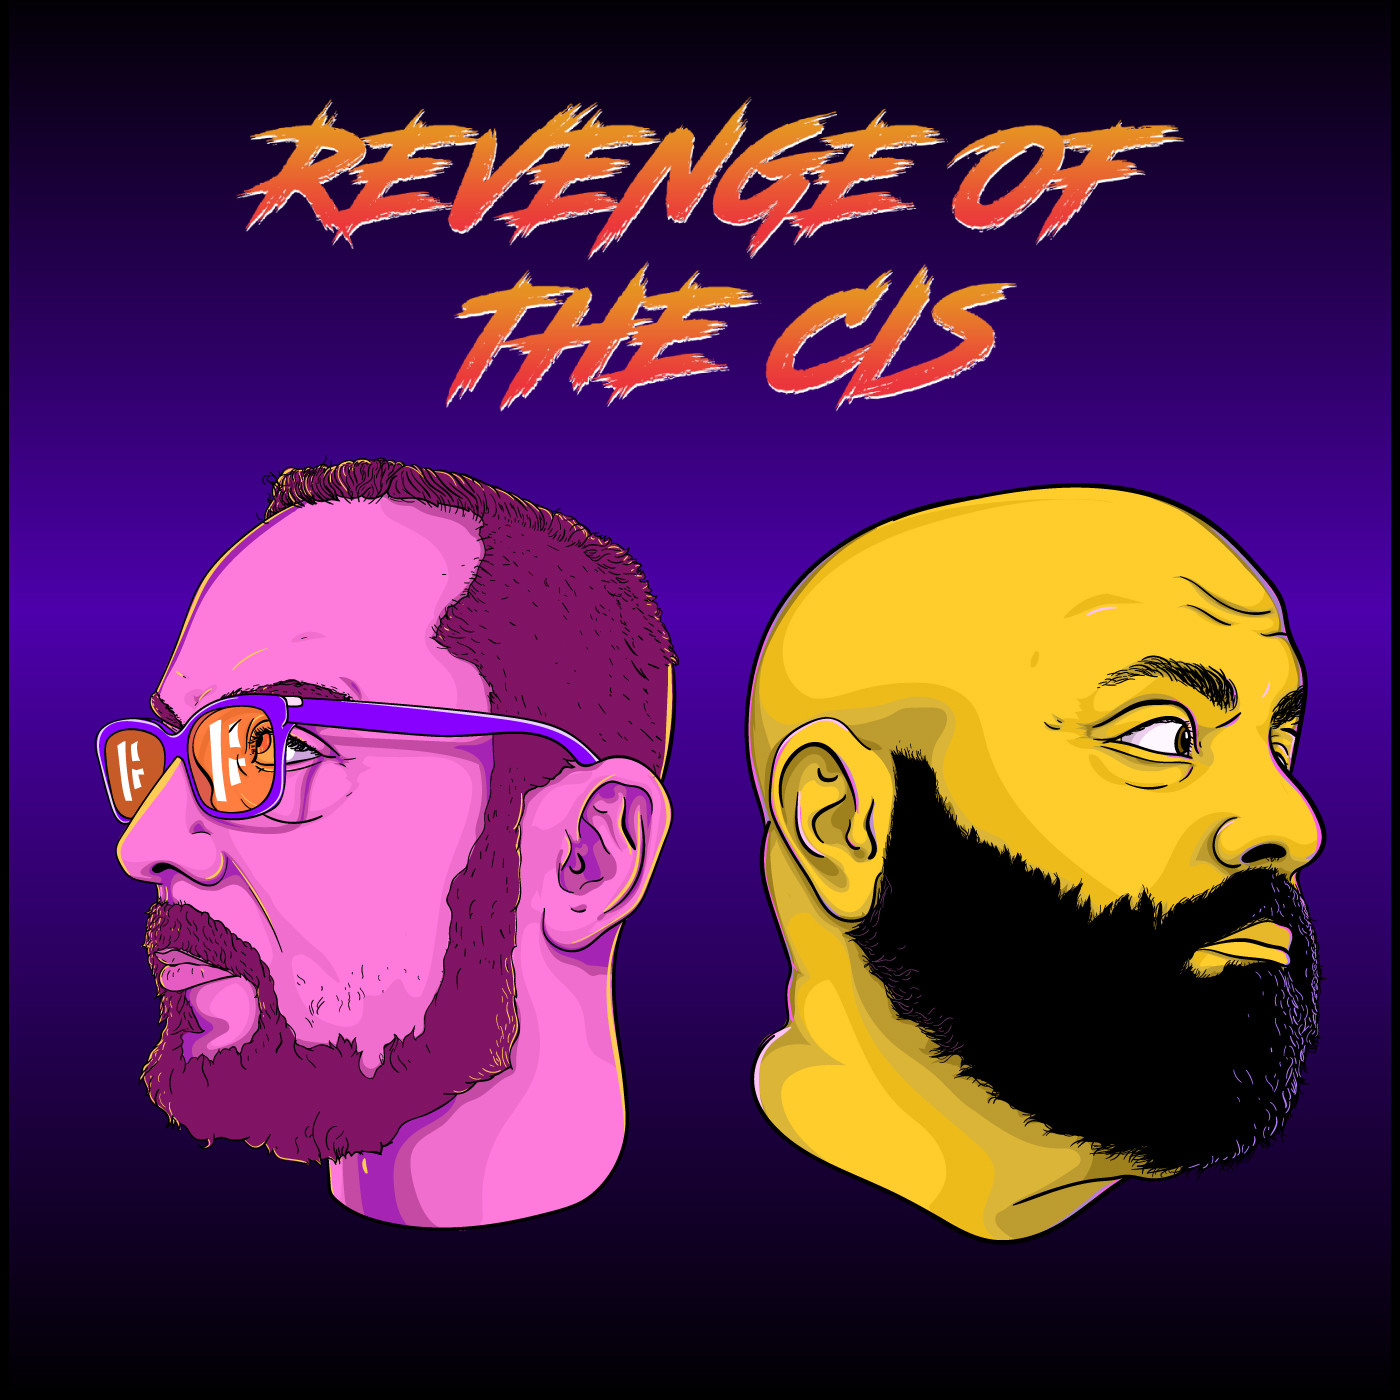 Revenge of the Cis: October 20th, 2020 - Revenge of the Cis – More Like Radio